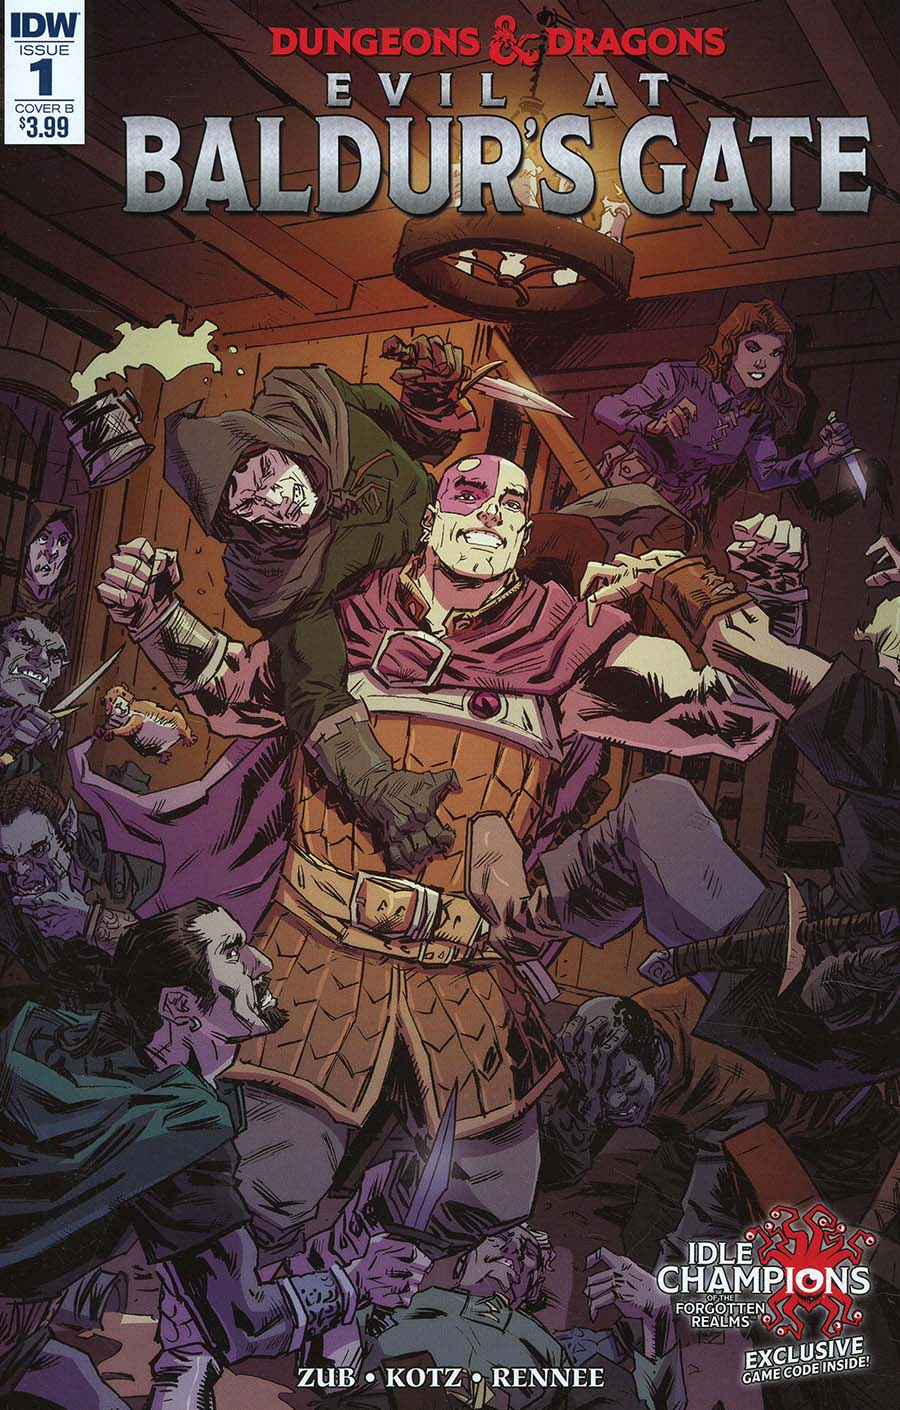 Dungeons & Dragons Evil At Baldurs Gate #1 Cover B Variant Dean Kotz Cover